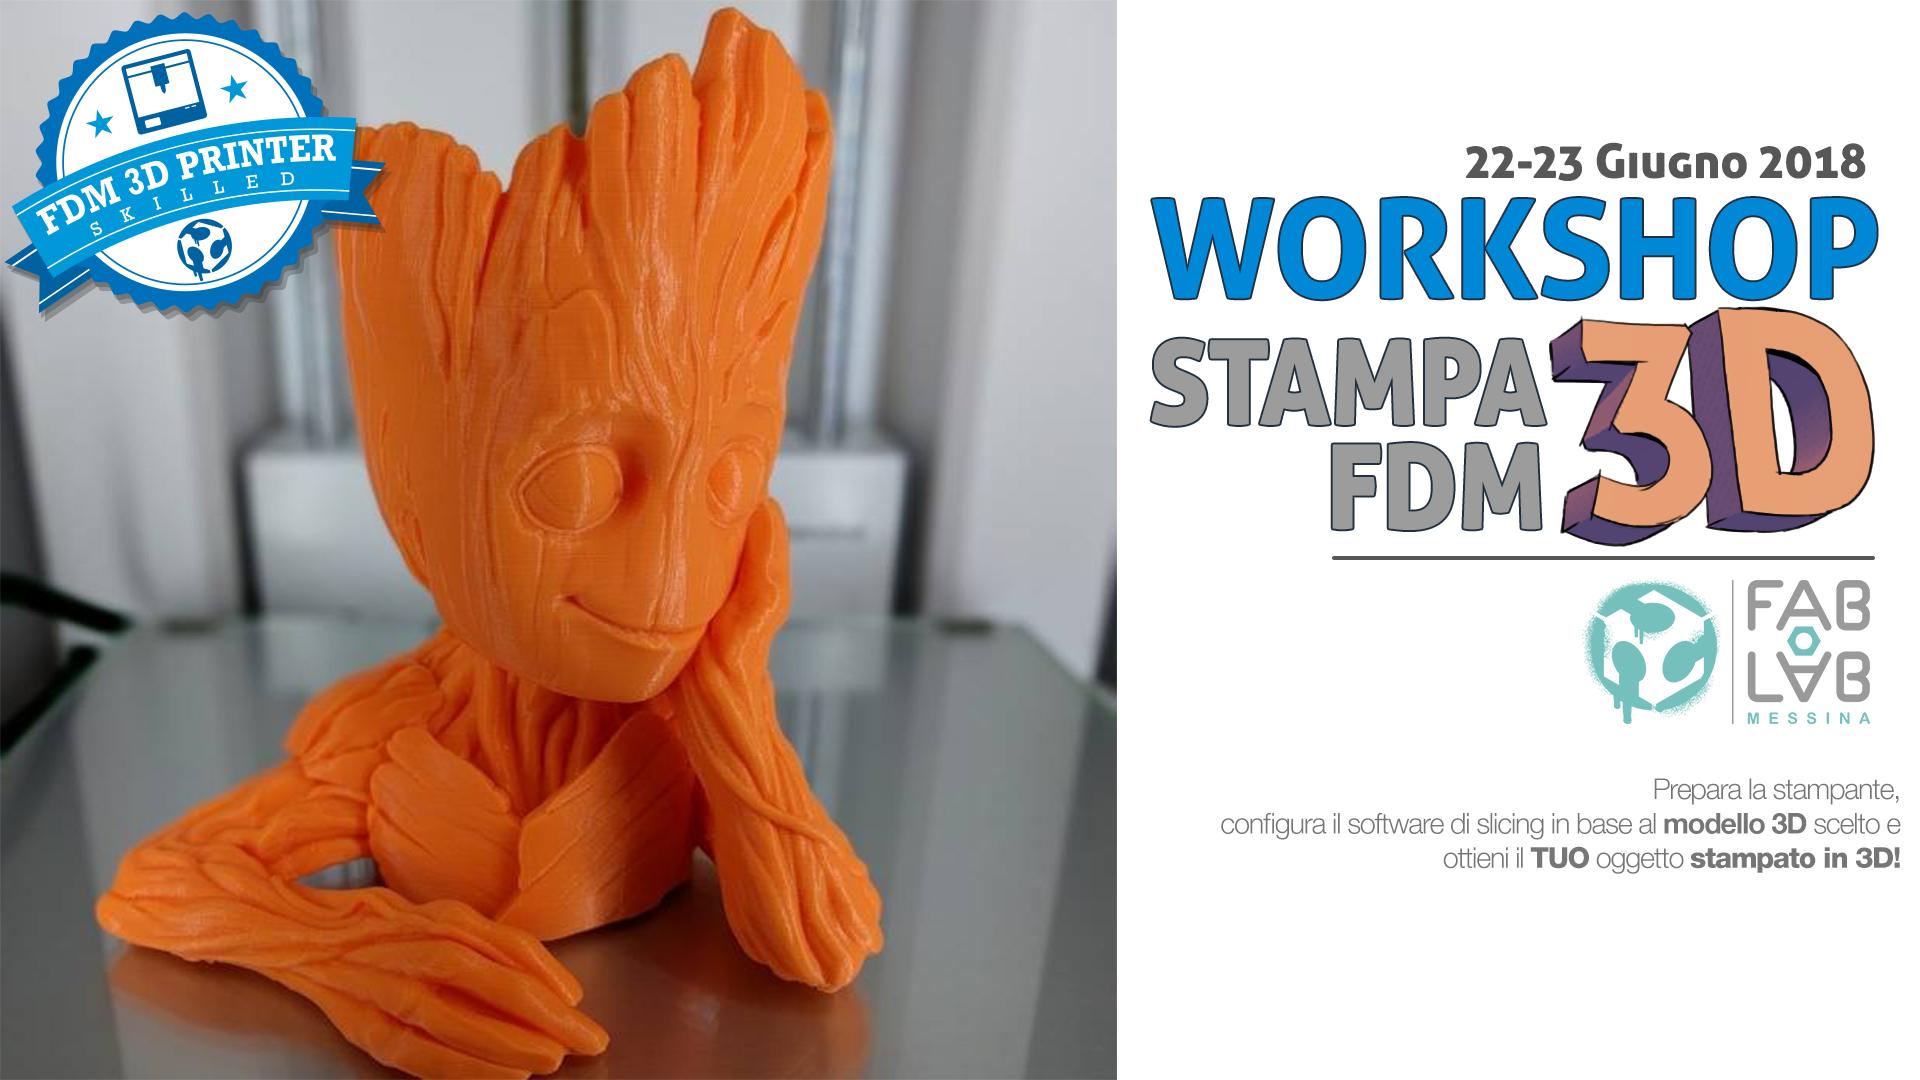 Workshop di Stampa 3D FDM